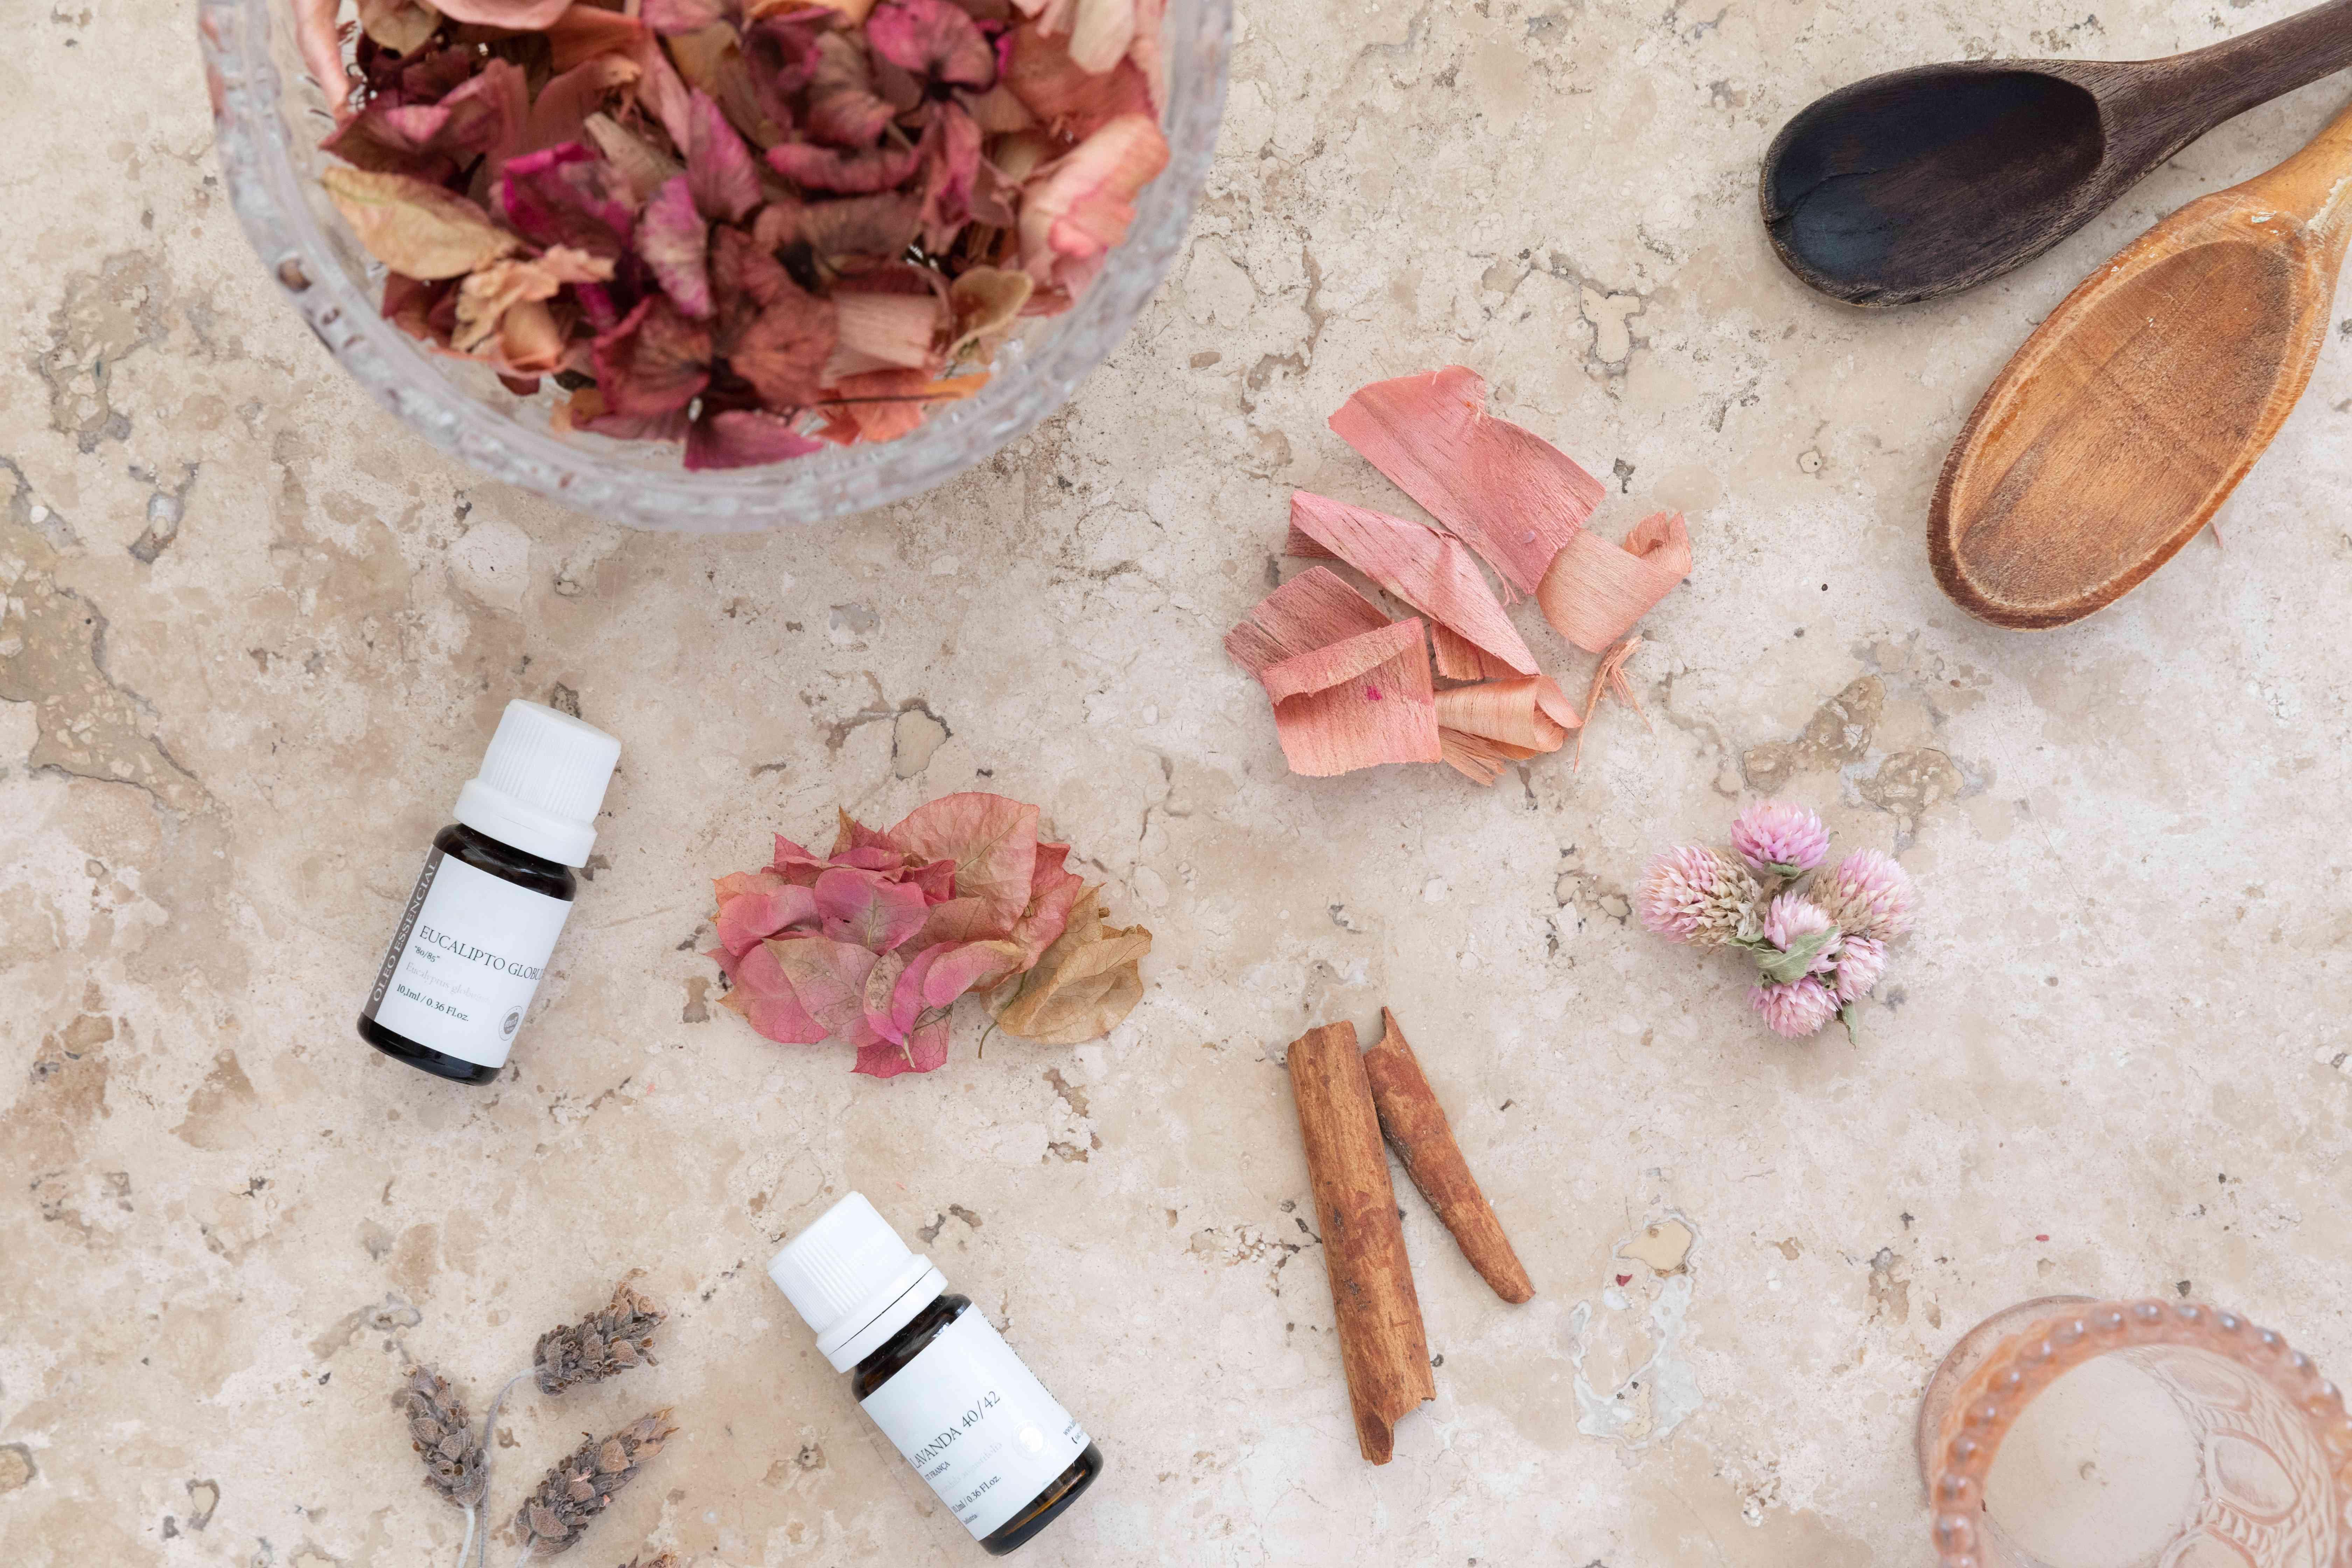 potpourri-making supplies